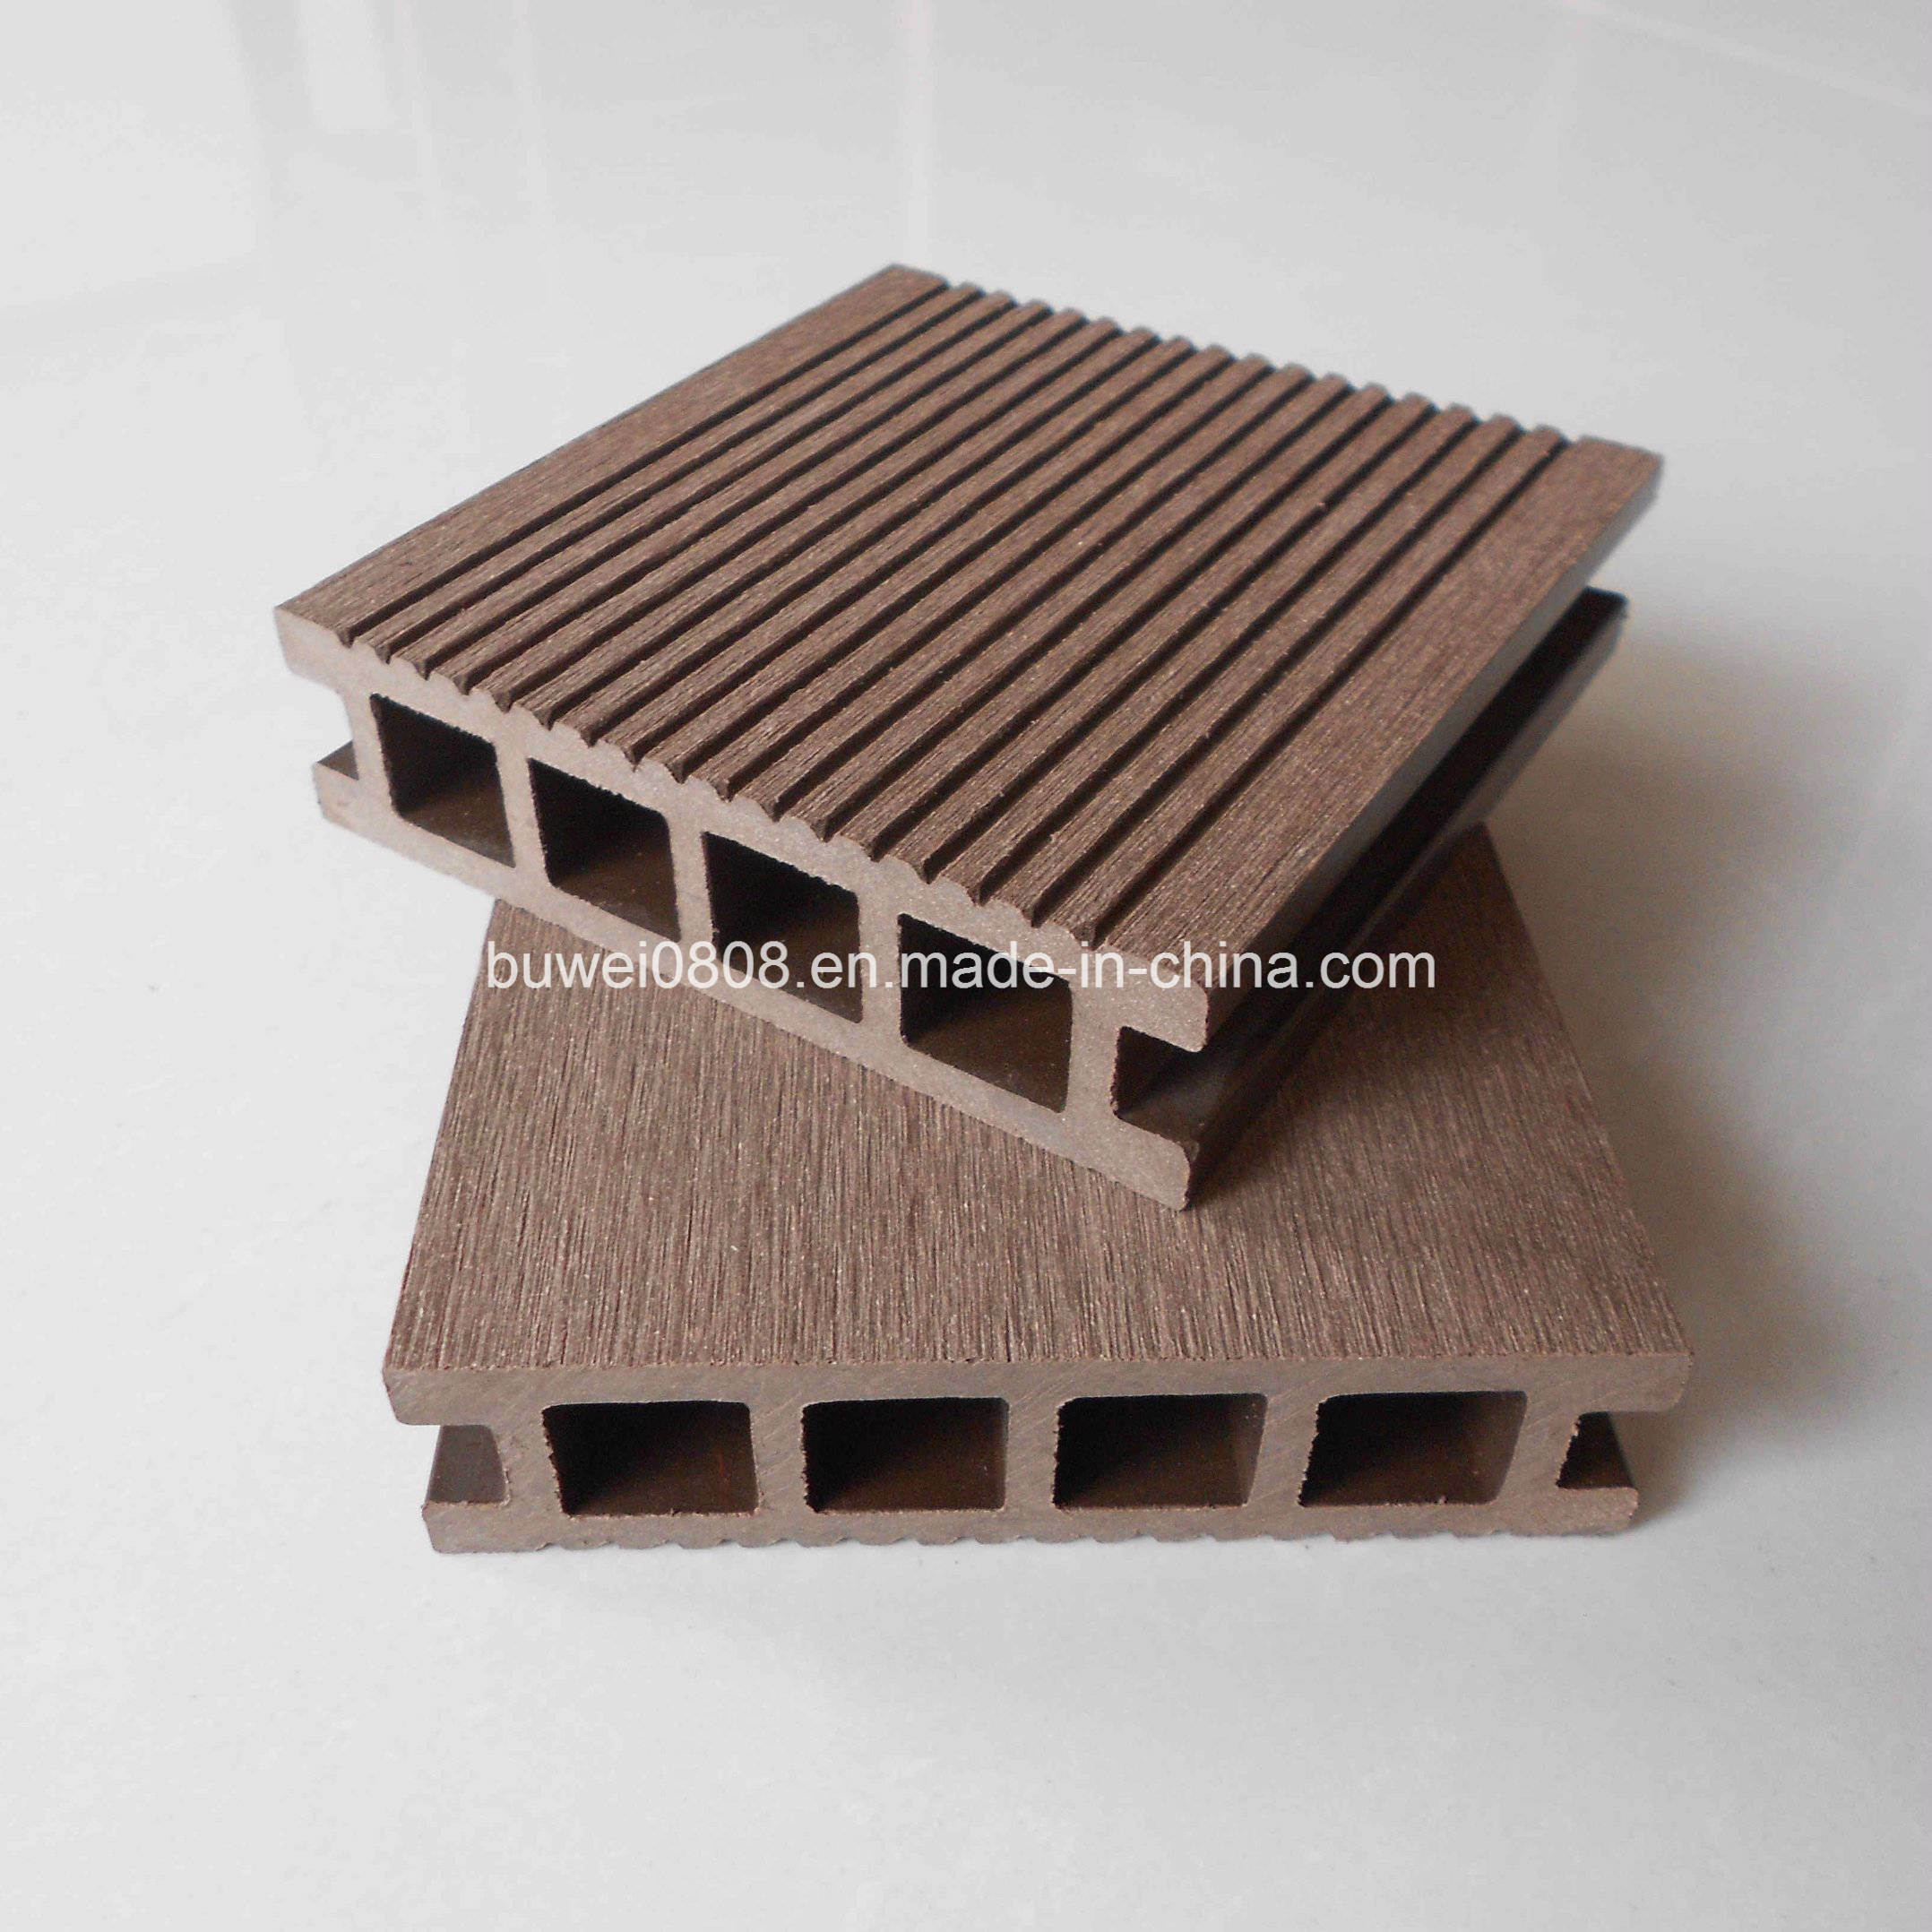 flooring for wood crop floor woods best decks deck ipe and the porches